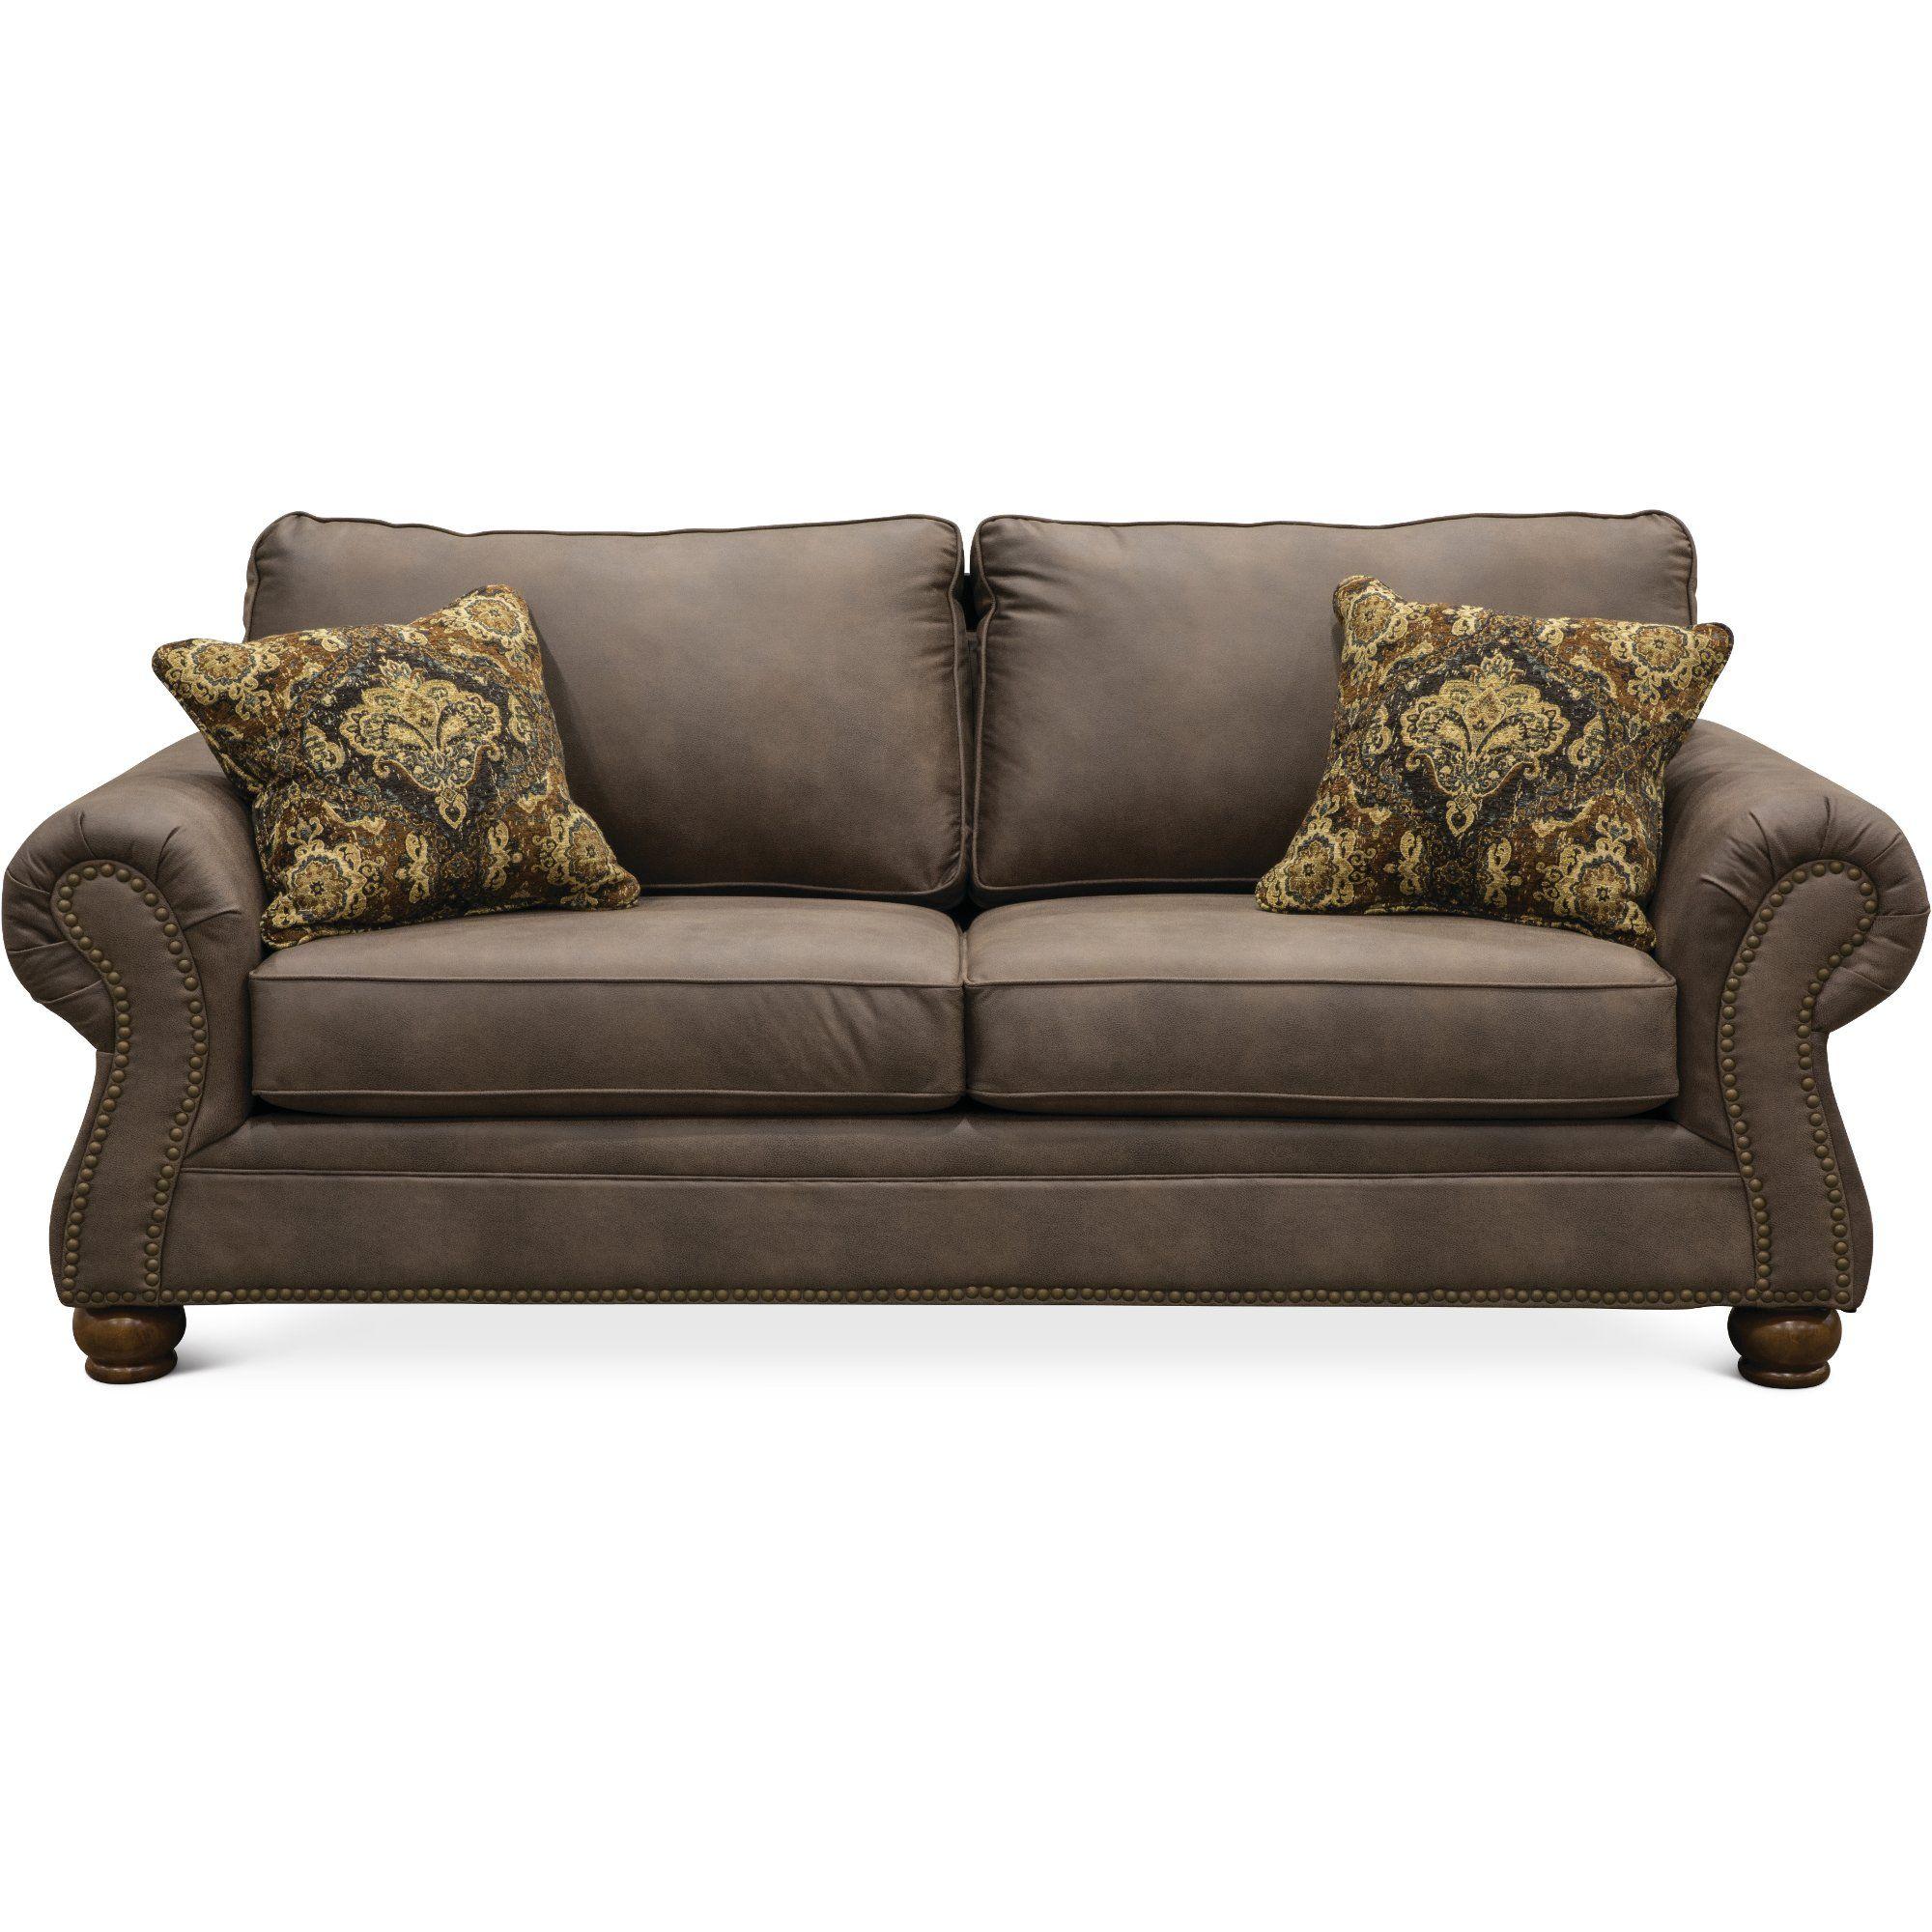 Casual Traditional Oak Brown Sofa Tahoe Luxury Furniture